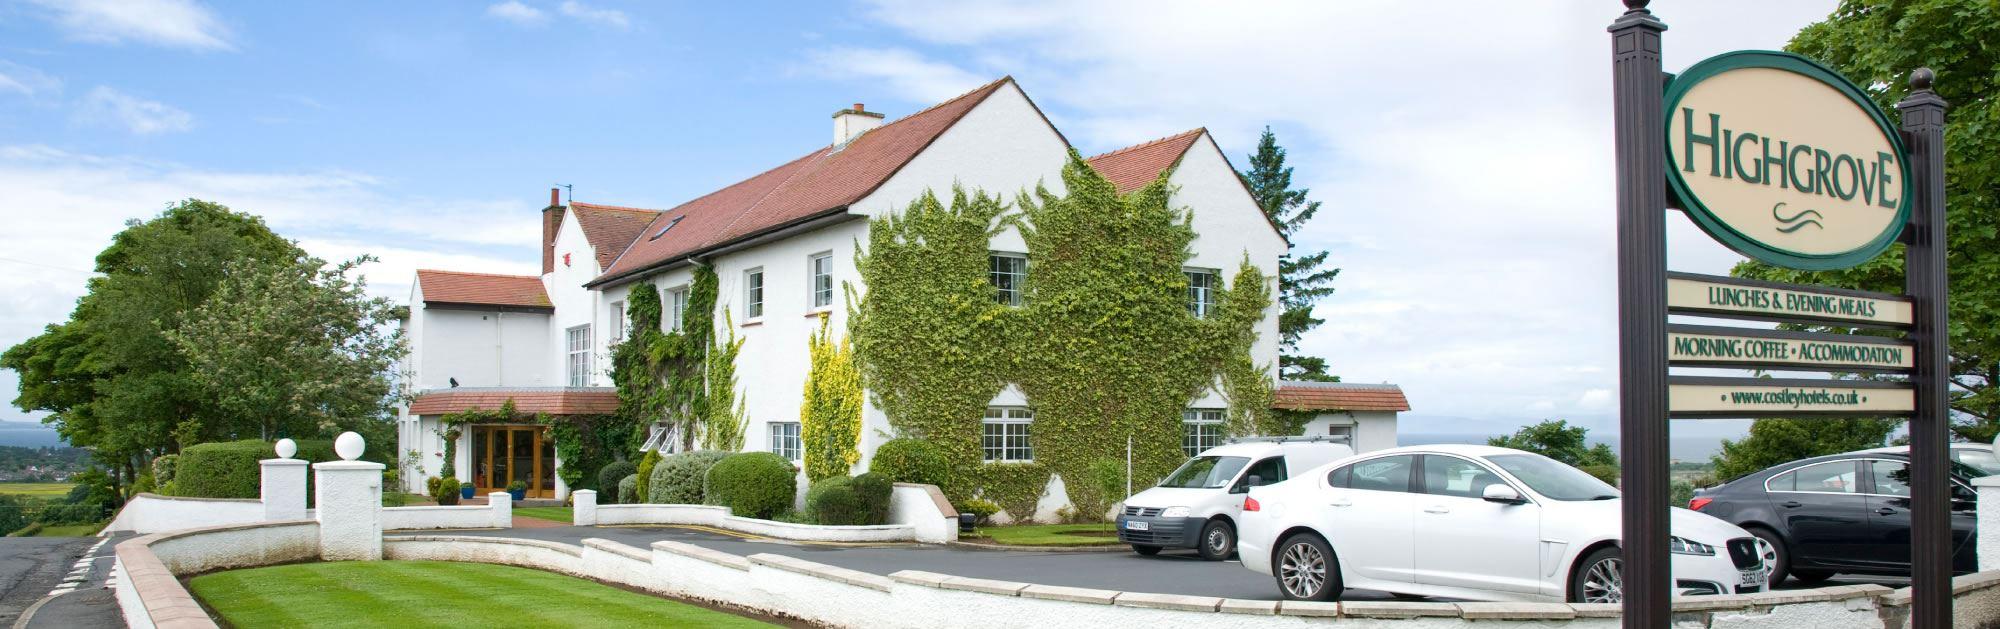 Highgrove House